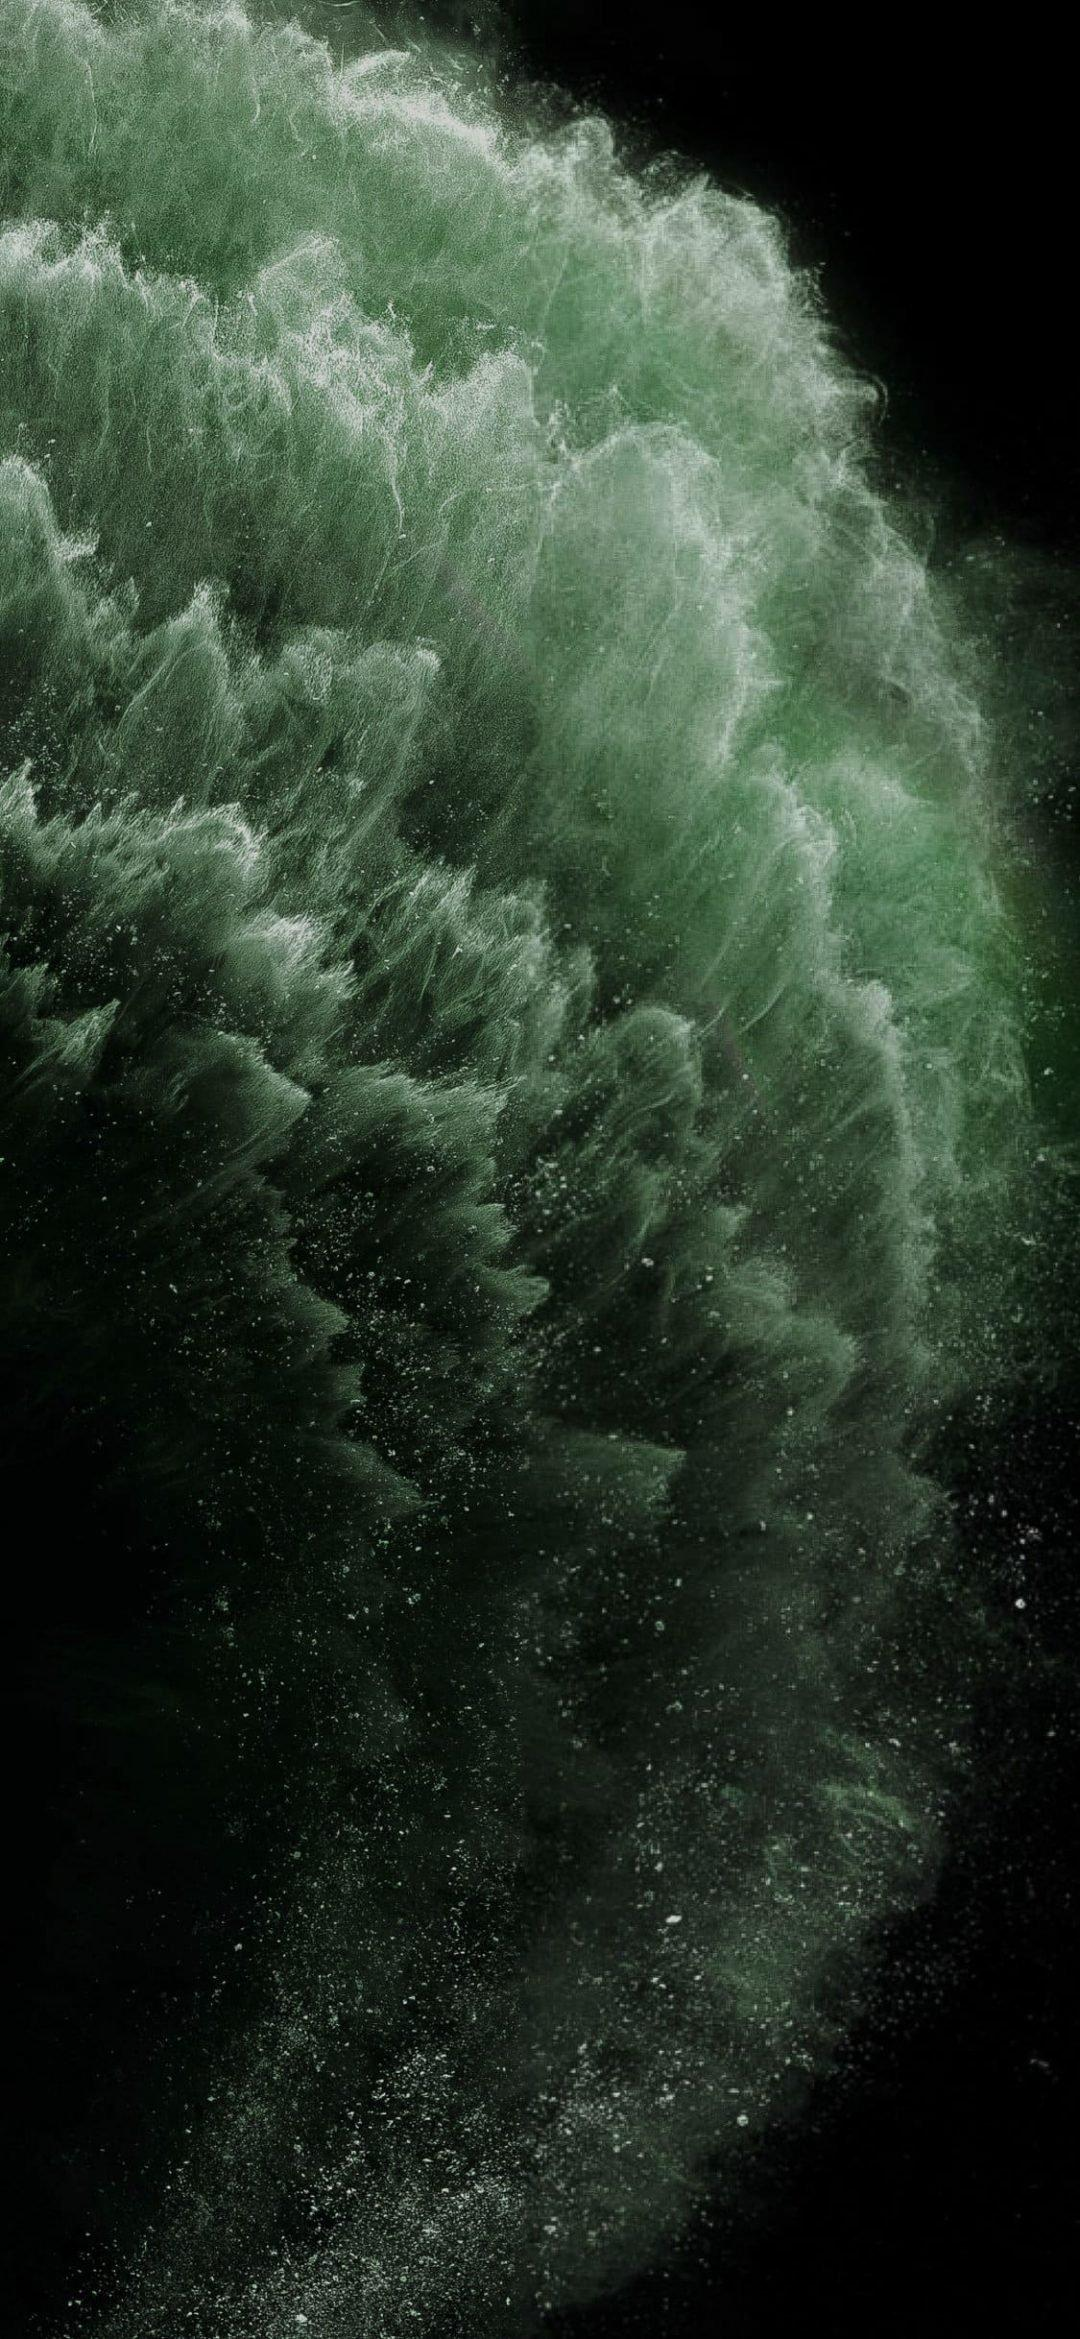 Midnight Green Wallpaper Iphone : midnight, green, wallpaper, iphone, Midnight, Green, IPhone, Wallpapers, Wallpaper